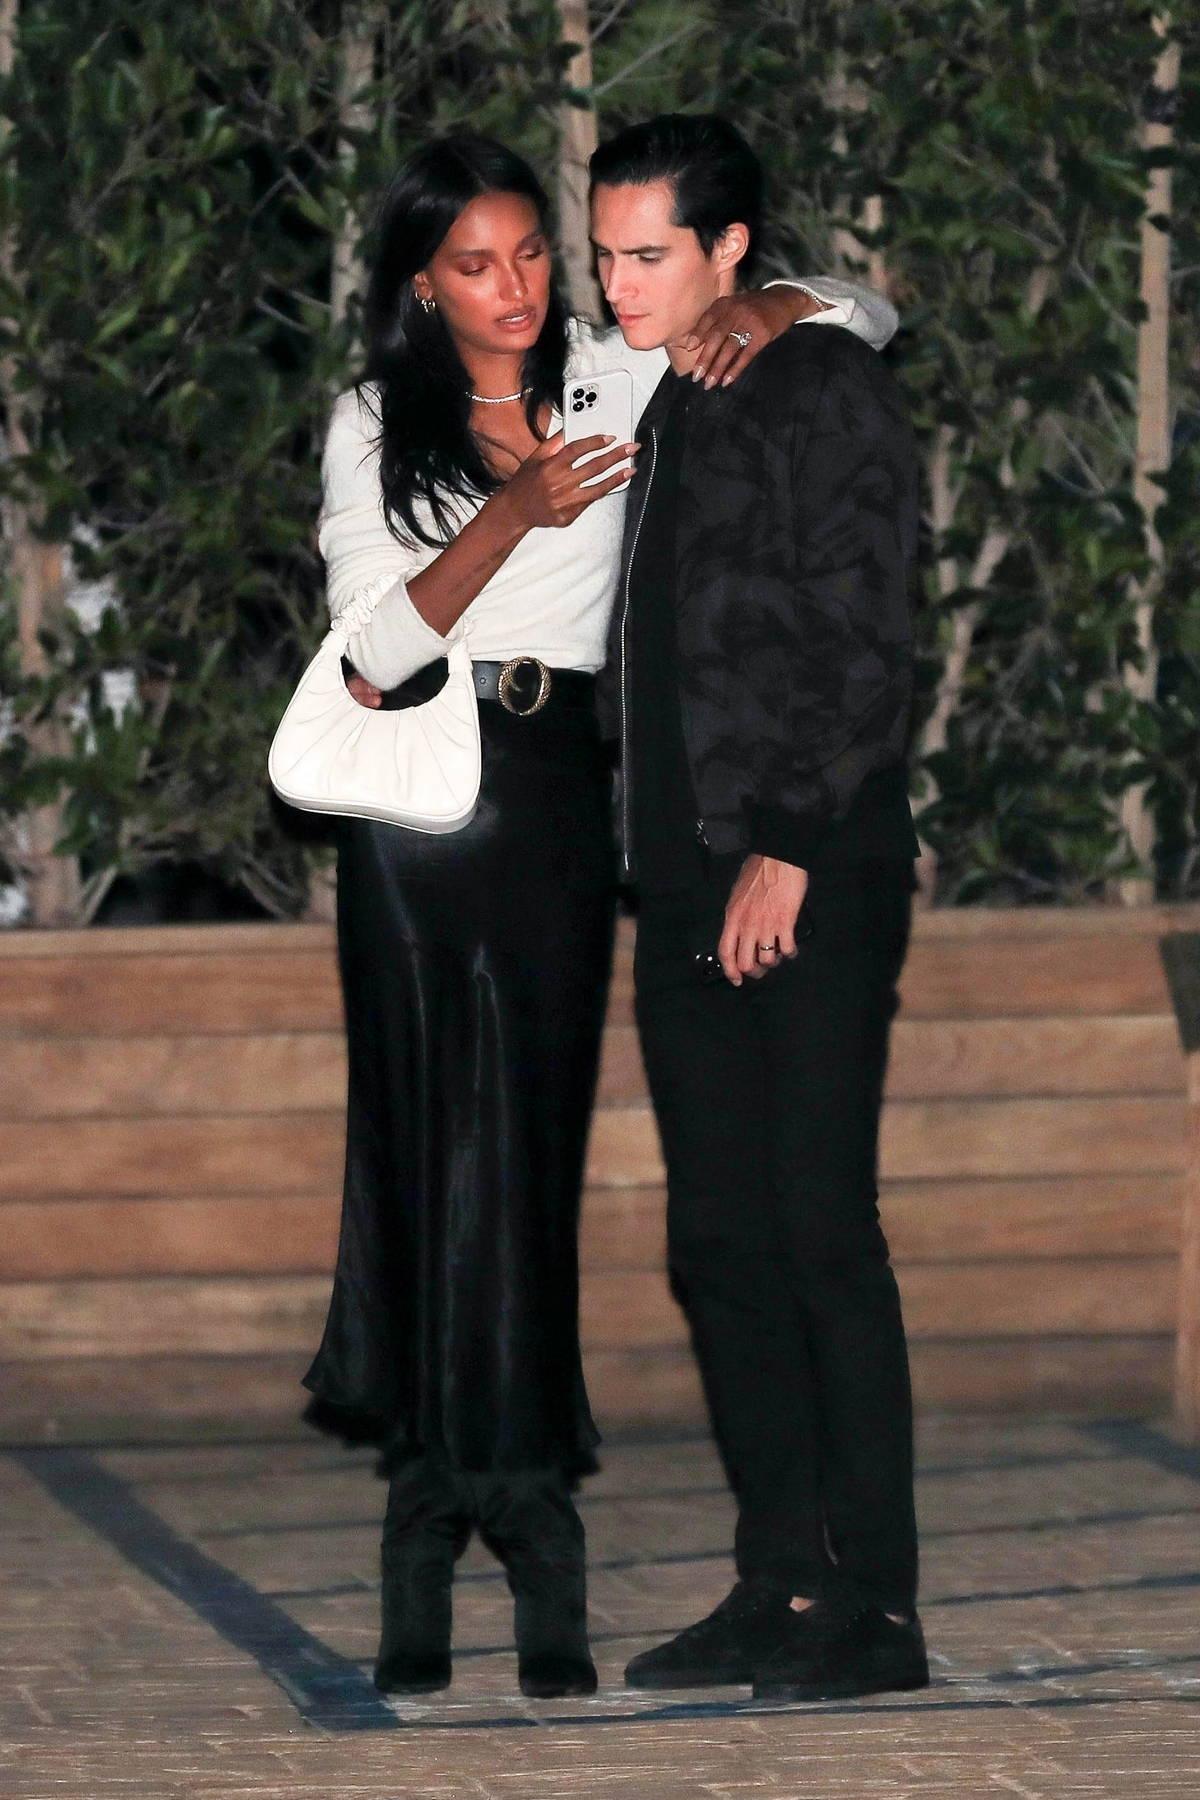 Jasmine Tookes and Juan David Borrero seen leaving after attending a friend's birthday at Soho House in Malibu, California